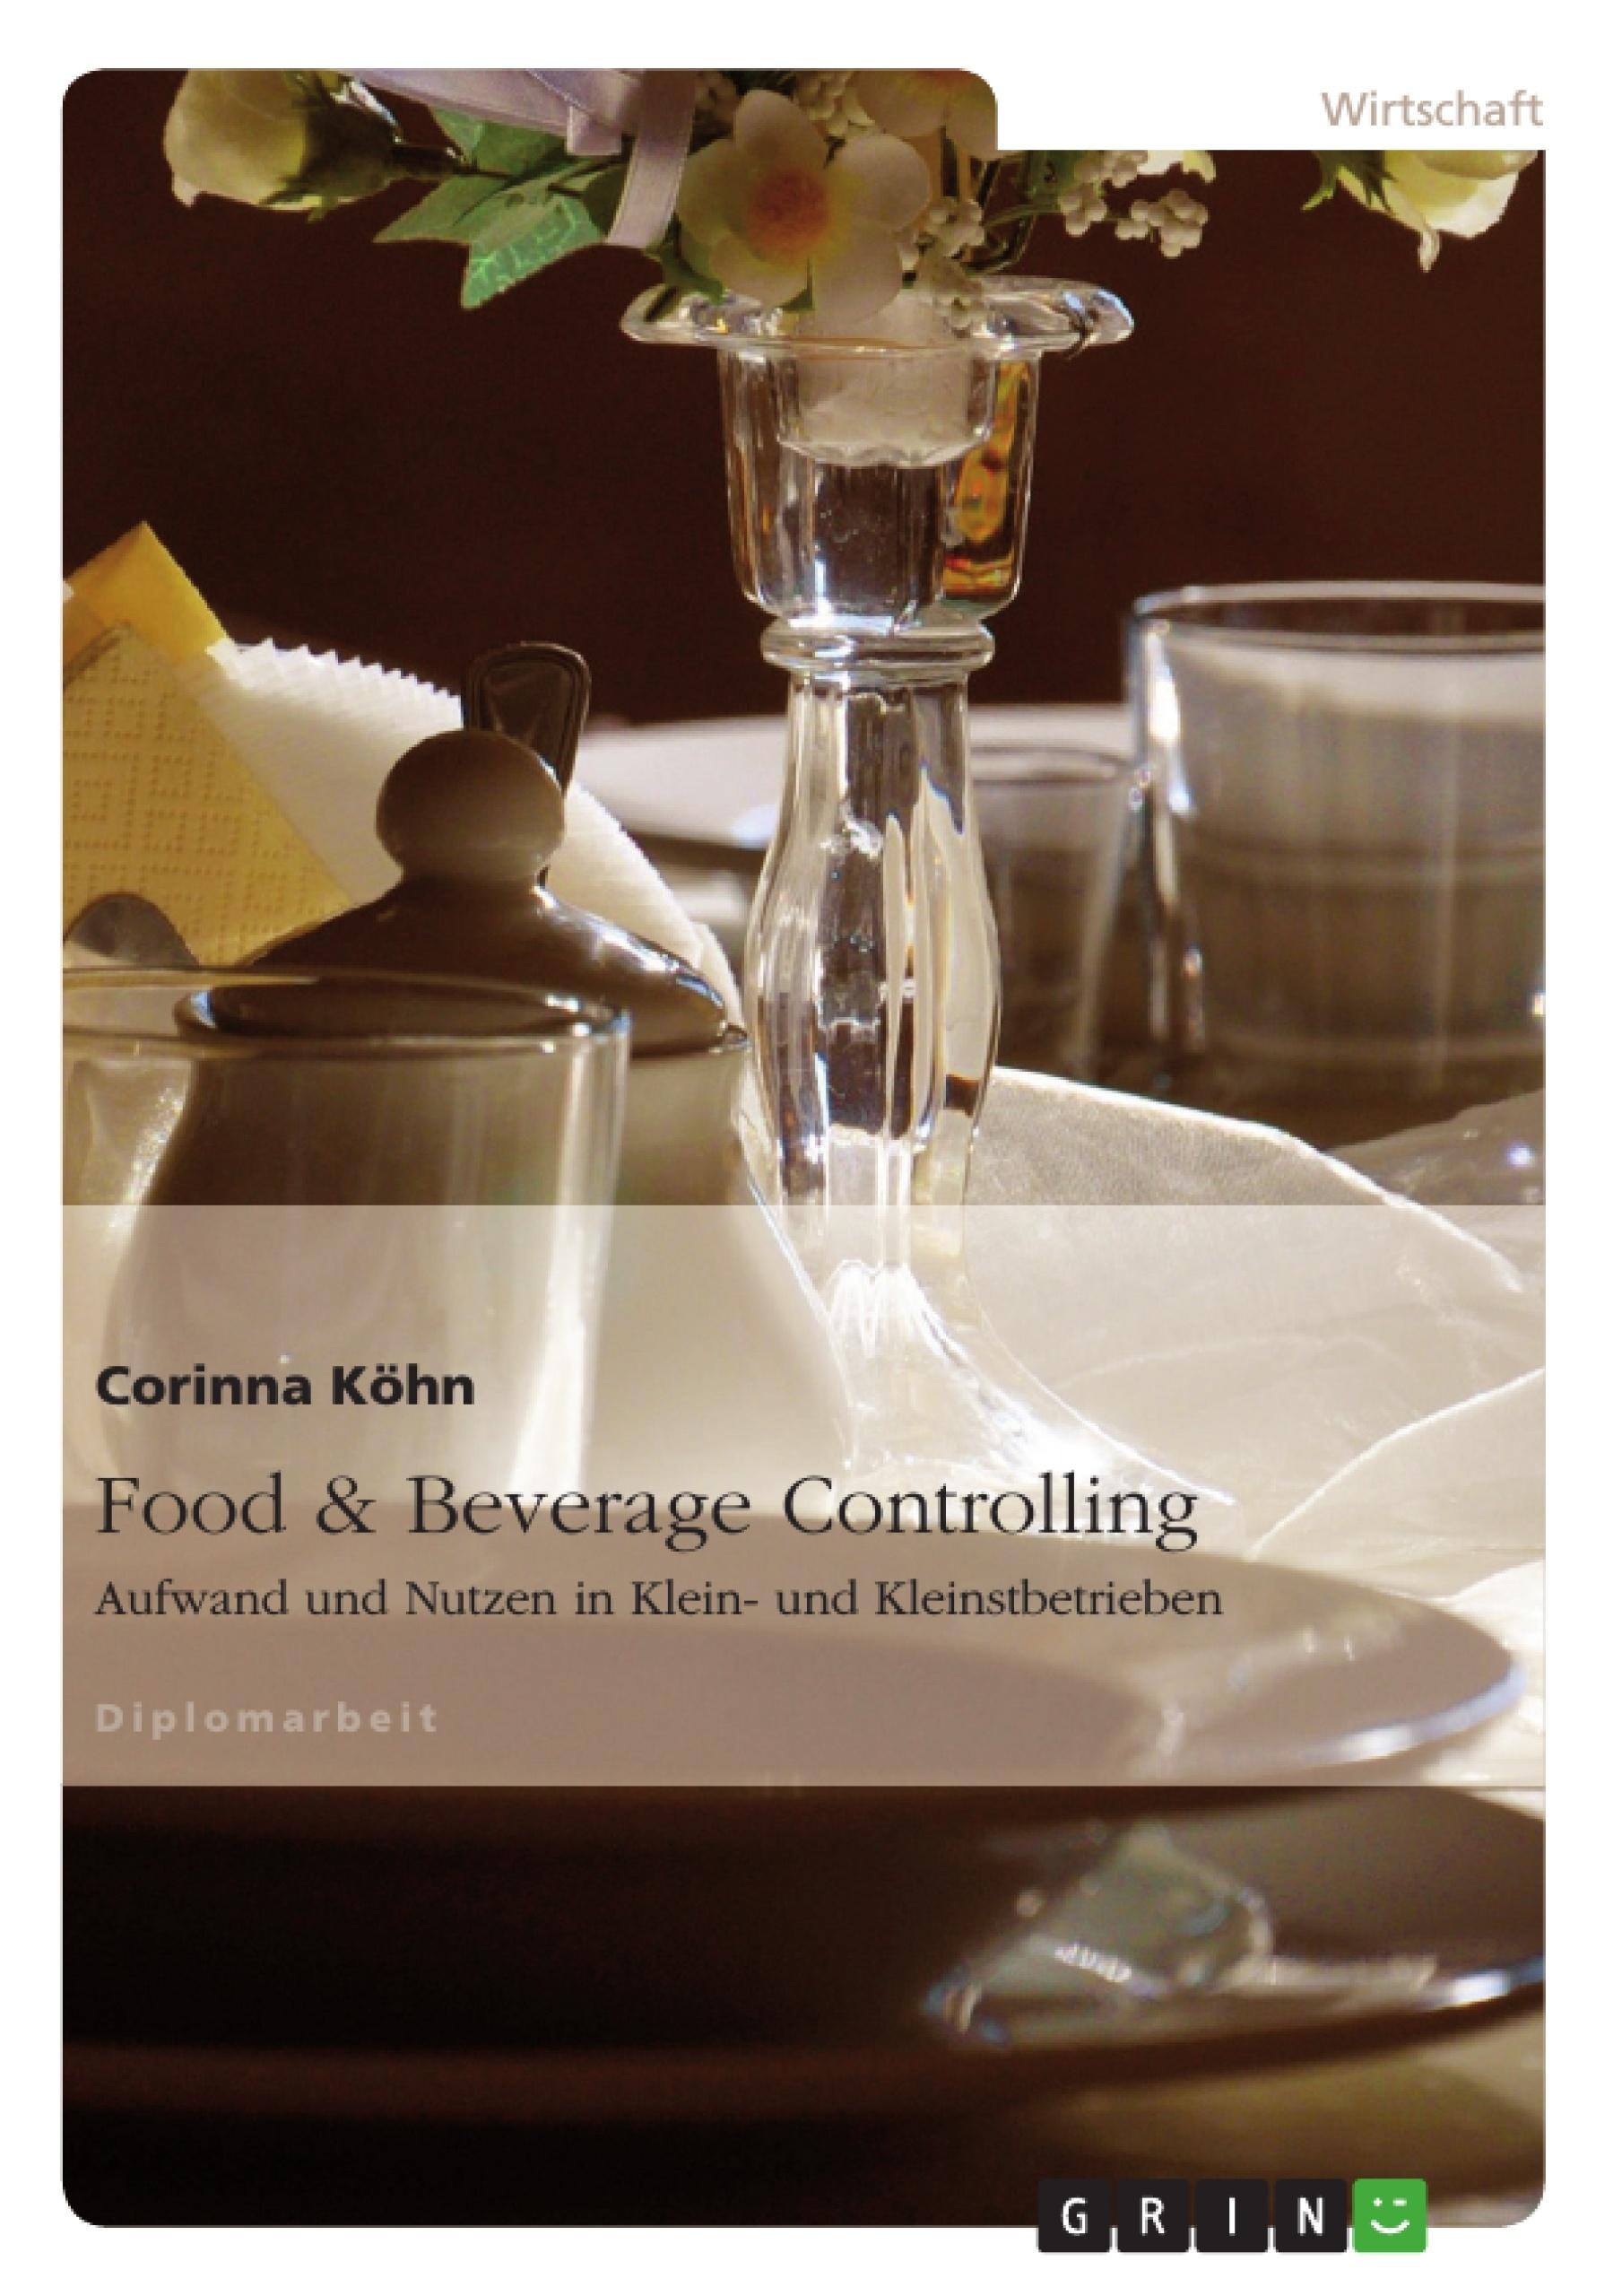 Titel: Food & Beverage Controlling